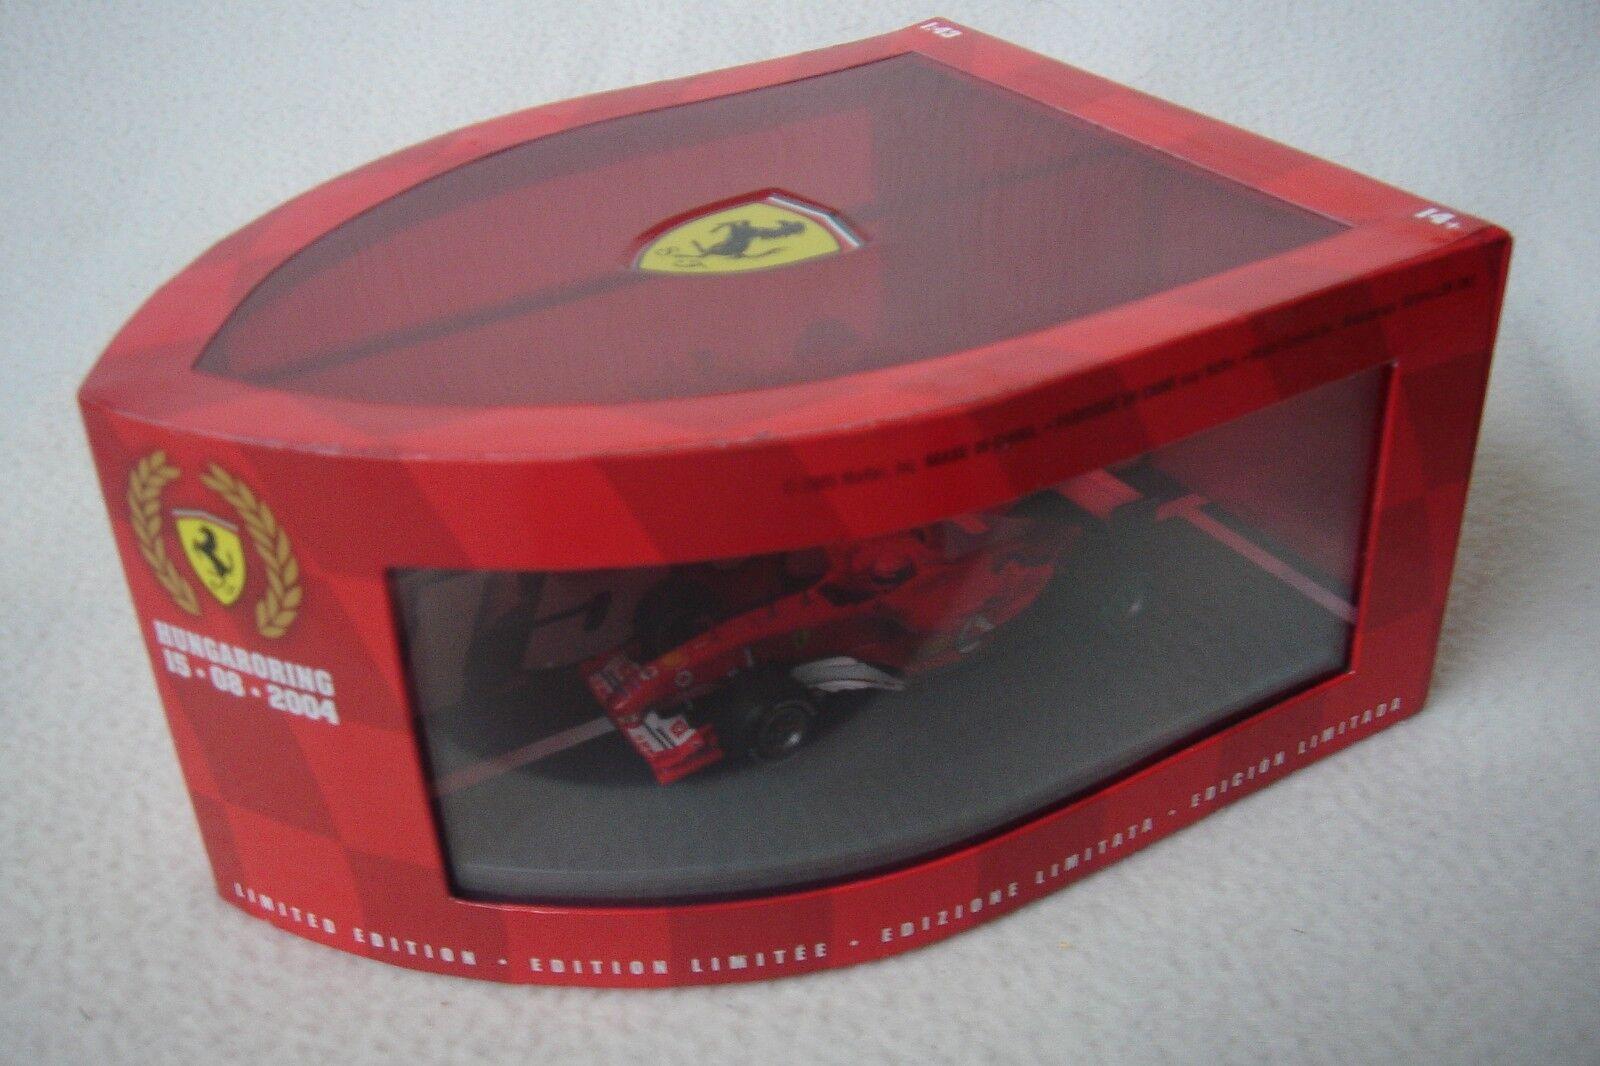 HOT WHEELS 1 43 FERRARI CAMPIONI COSTRUTTORI 2004 Schumacher Barrichello B6223